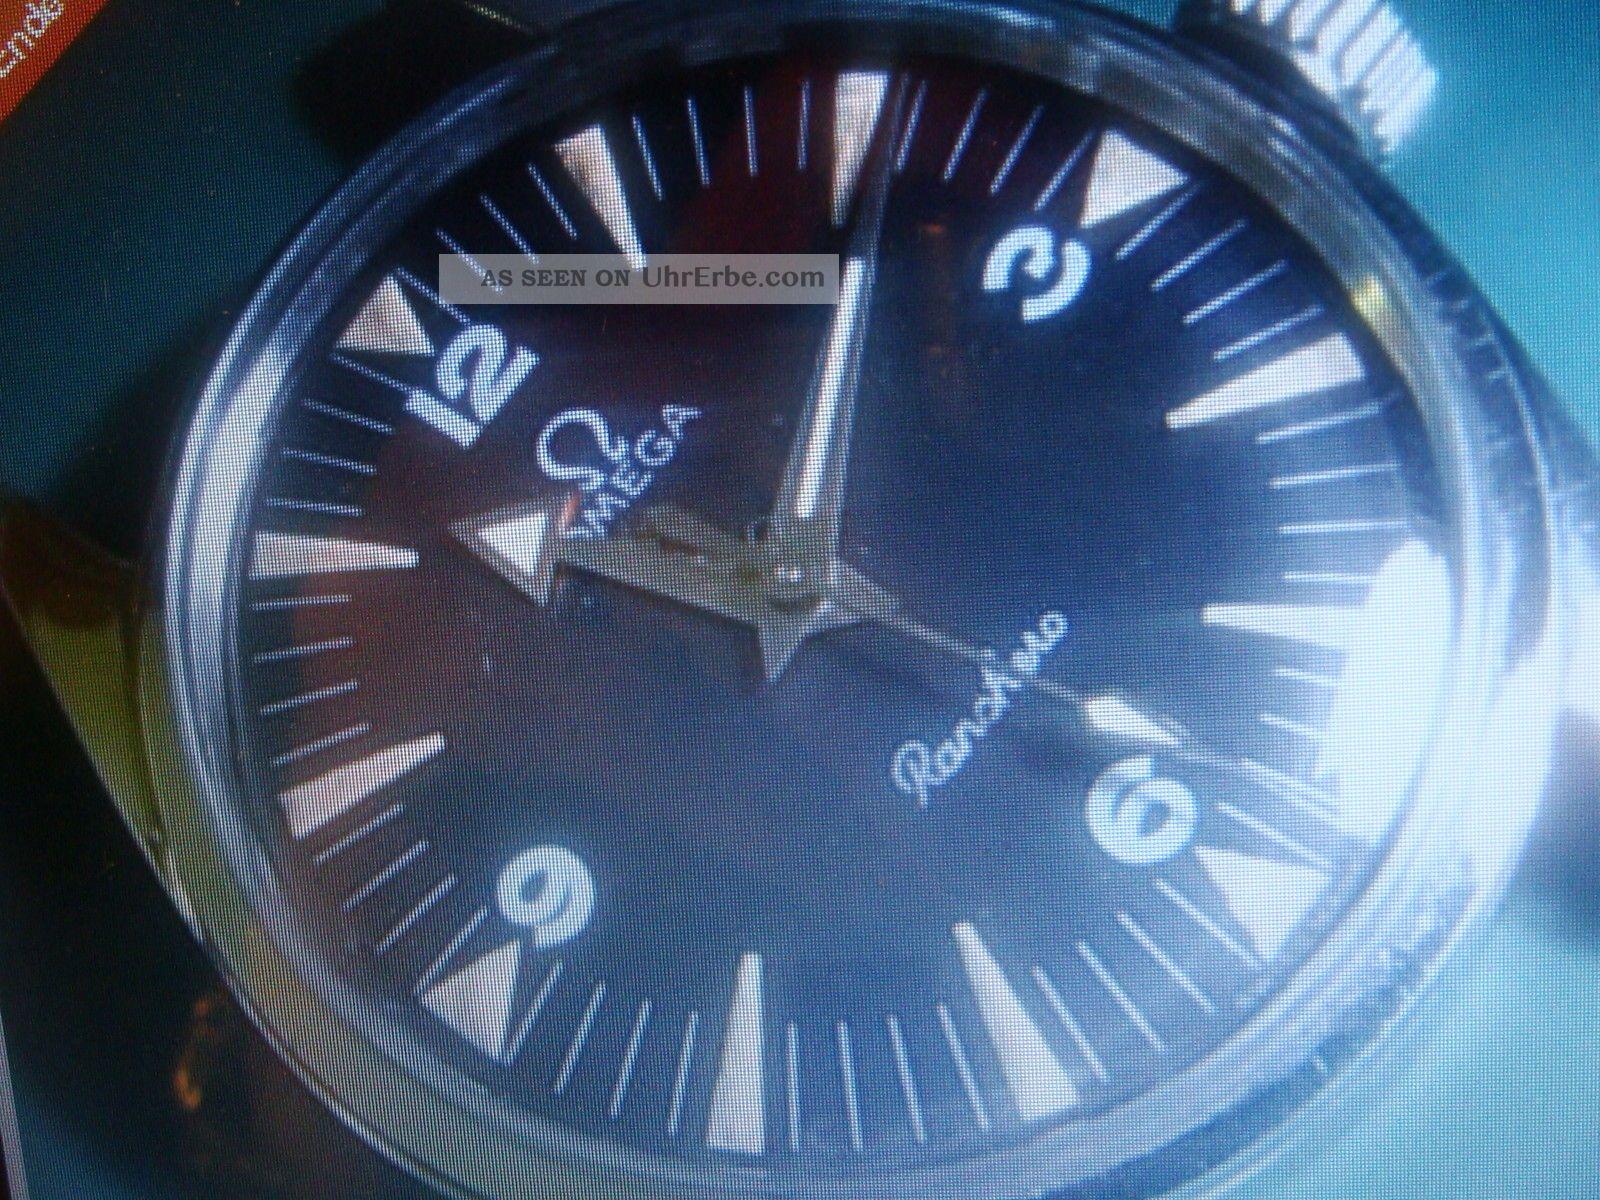 Omega Ranchero Handaufzug Kaliber 285 60iger Jahre Armbanduhren Bild